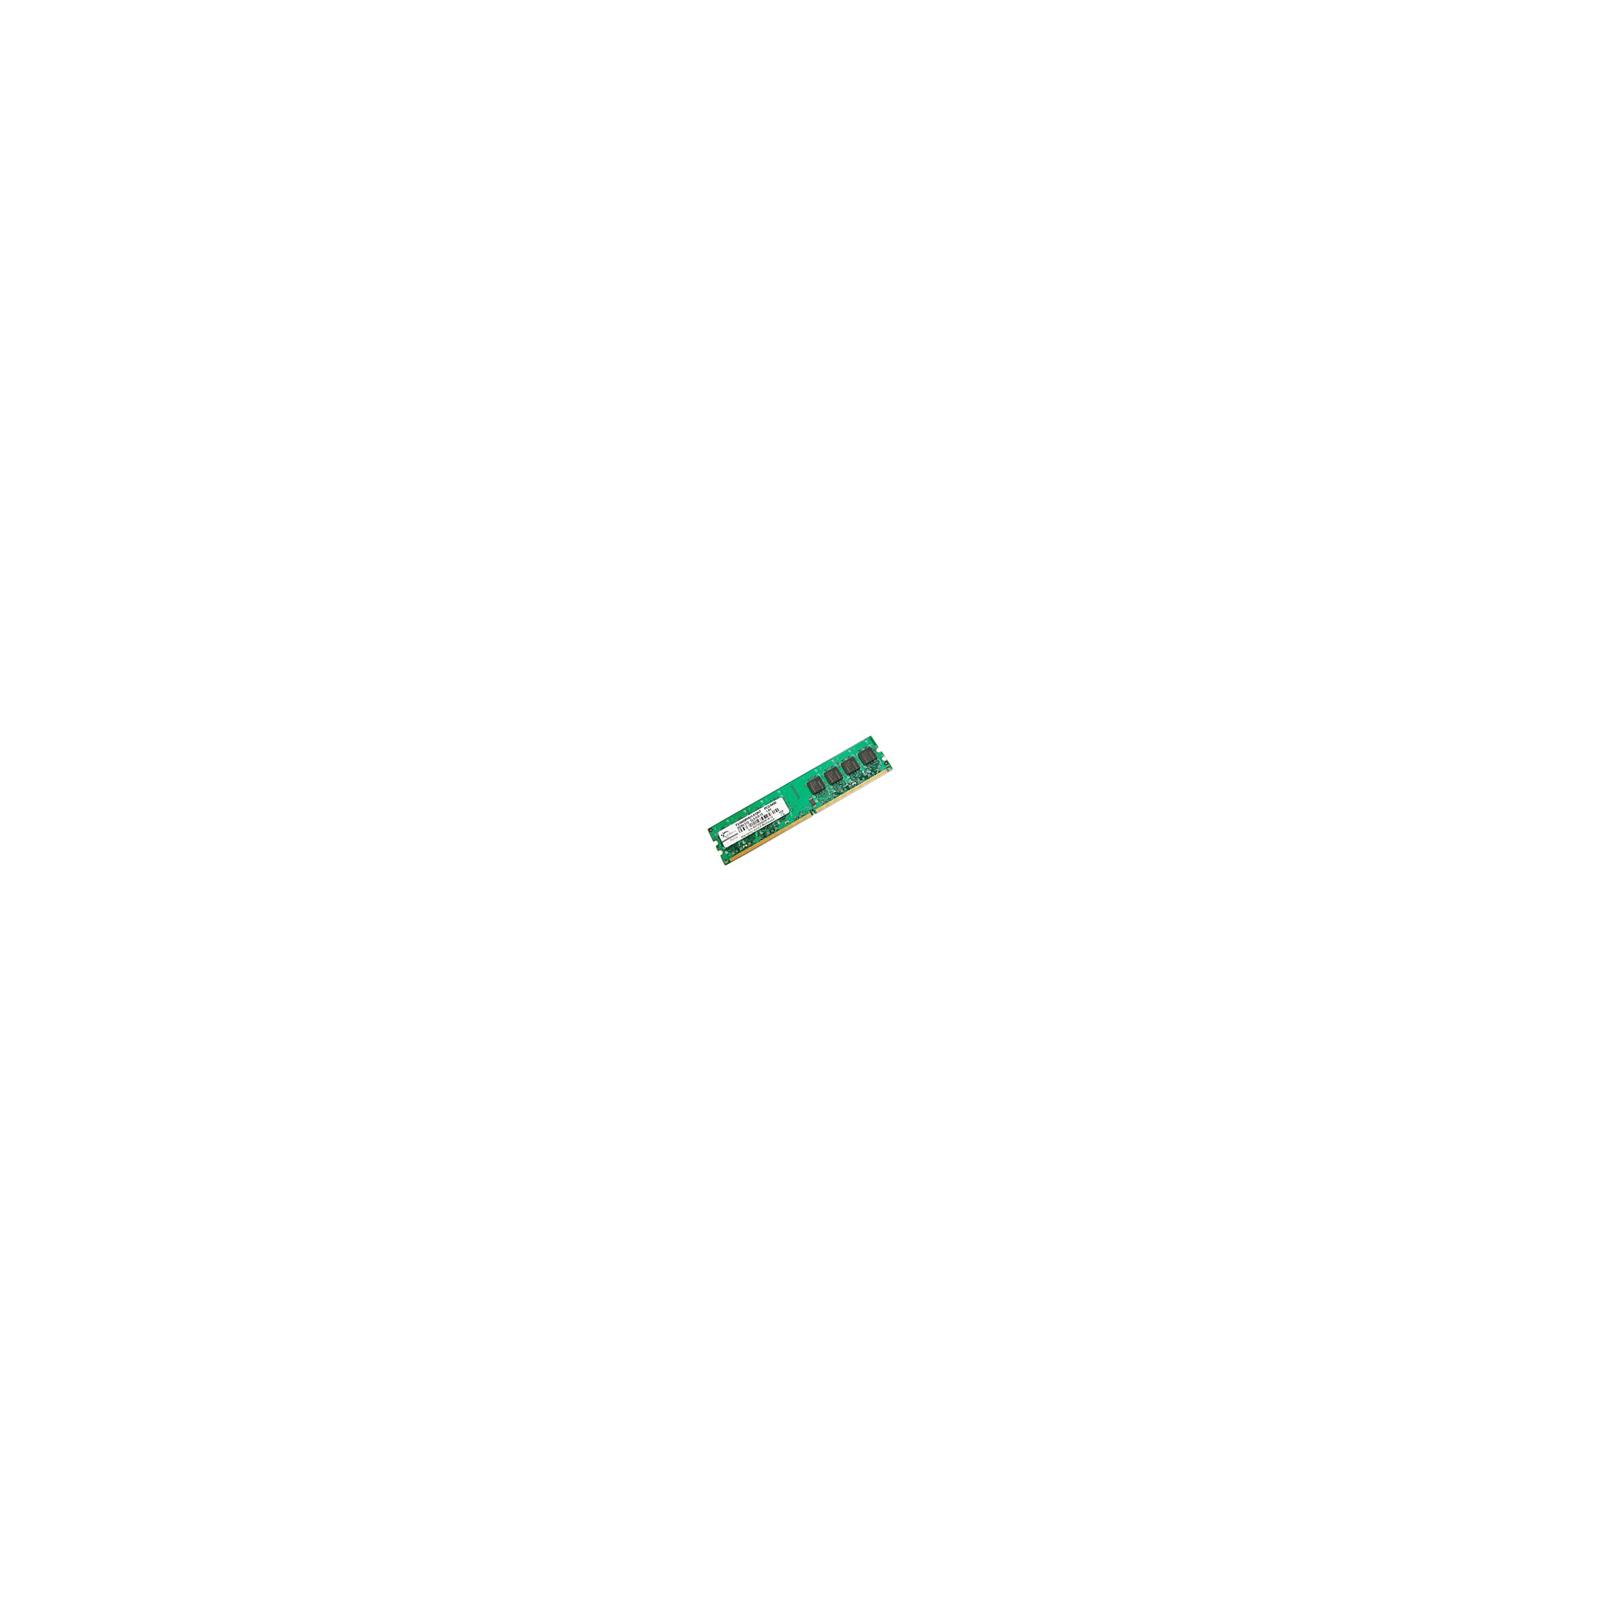 Модуль памяти для компьютера DDR2 2GB 800 MHz G.Skill (F2-6400CL5S-2GBNT)